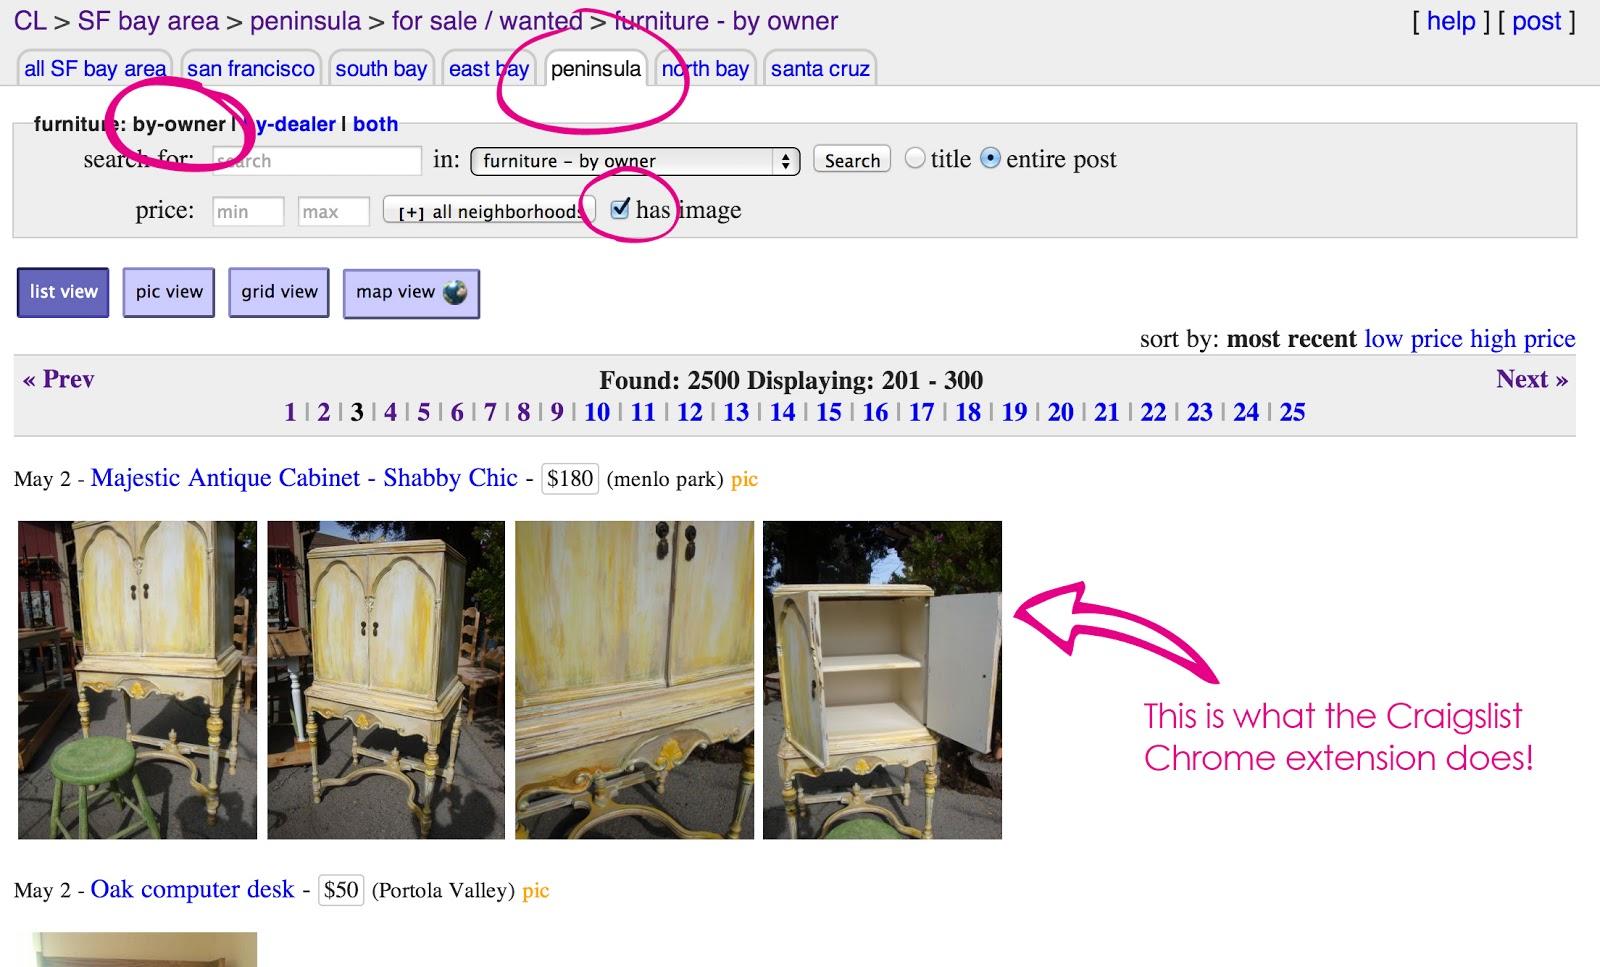 Remarkable Swingncocoa How To Win At Craiglist Spiritservingveterans Wood Chair Design Ideas Spiritservingveteransorg